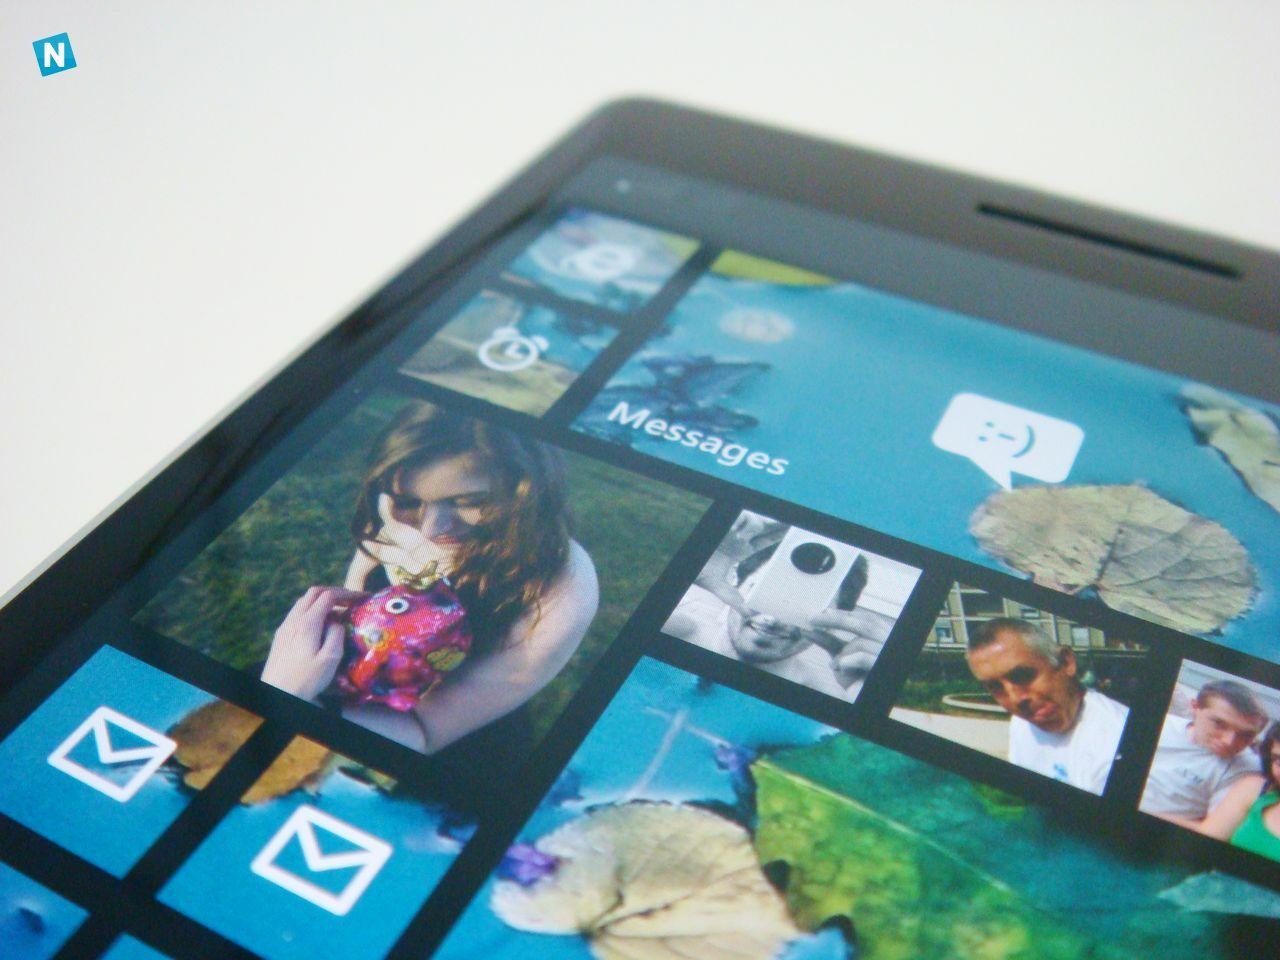 [Promo] Lumia 930 à seulement 339€ !